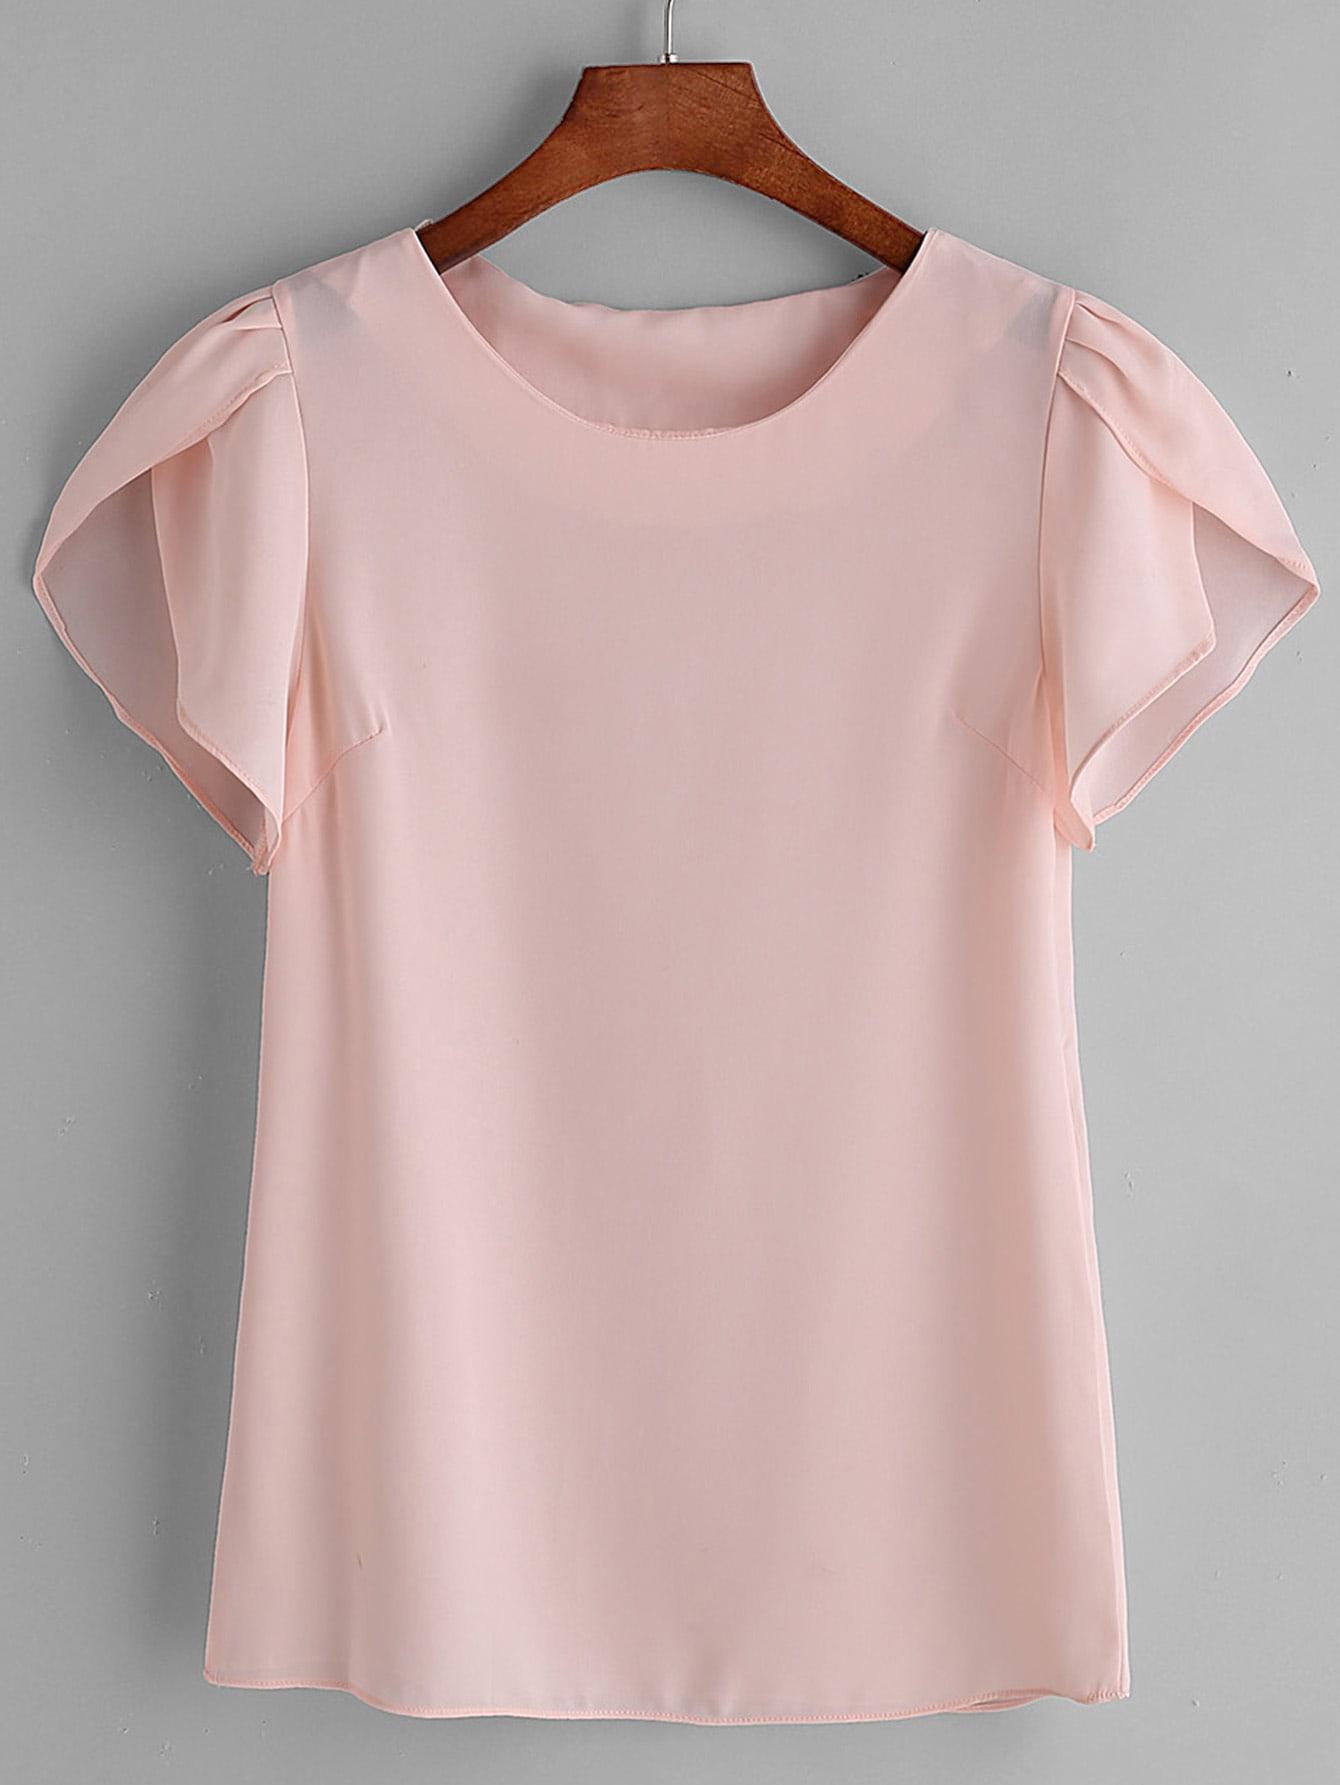 7b7496a9e3a589 Pink Pleated Cap Sleeve Chiffon Blouse EmmaCloth-Women Fast Fashion ...